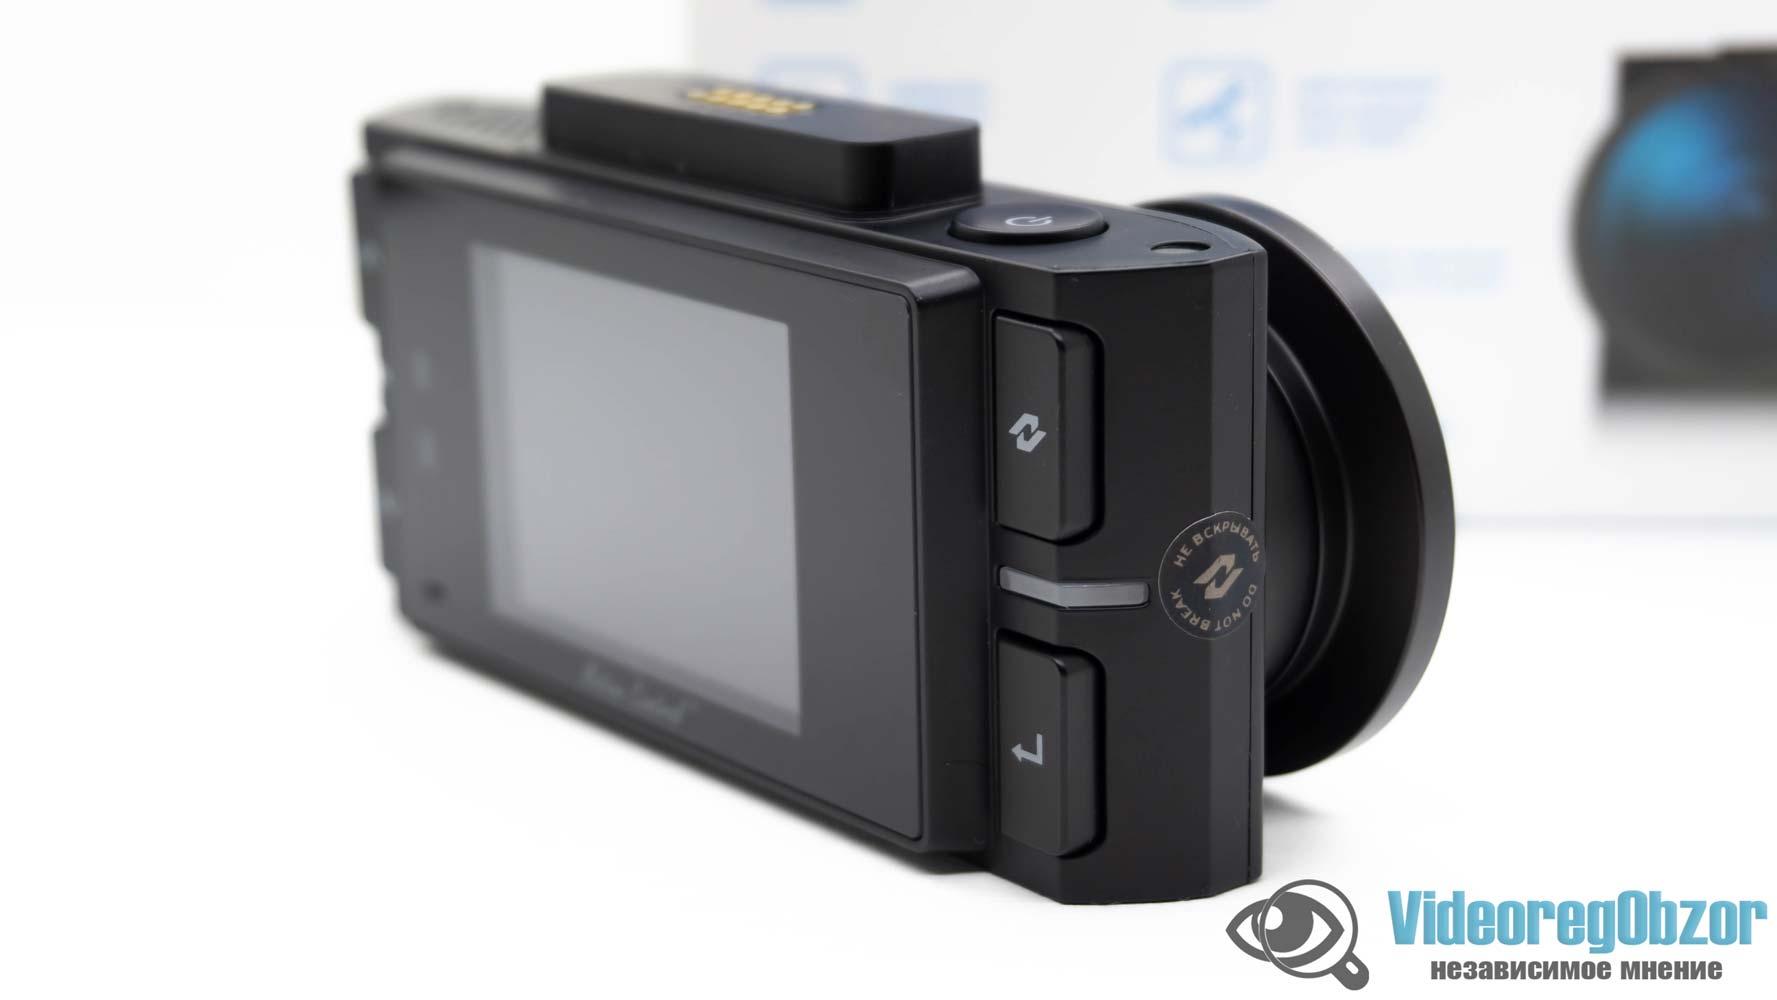 Neoline X COP 9200 обзор 16 VideoregObzor Neoline X-COP 9200: обзор видеорегистратора с радар-детектором